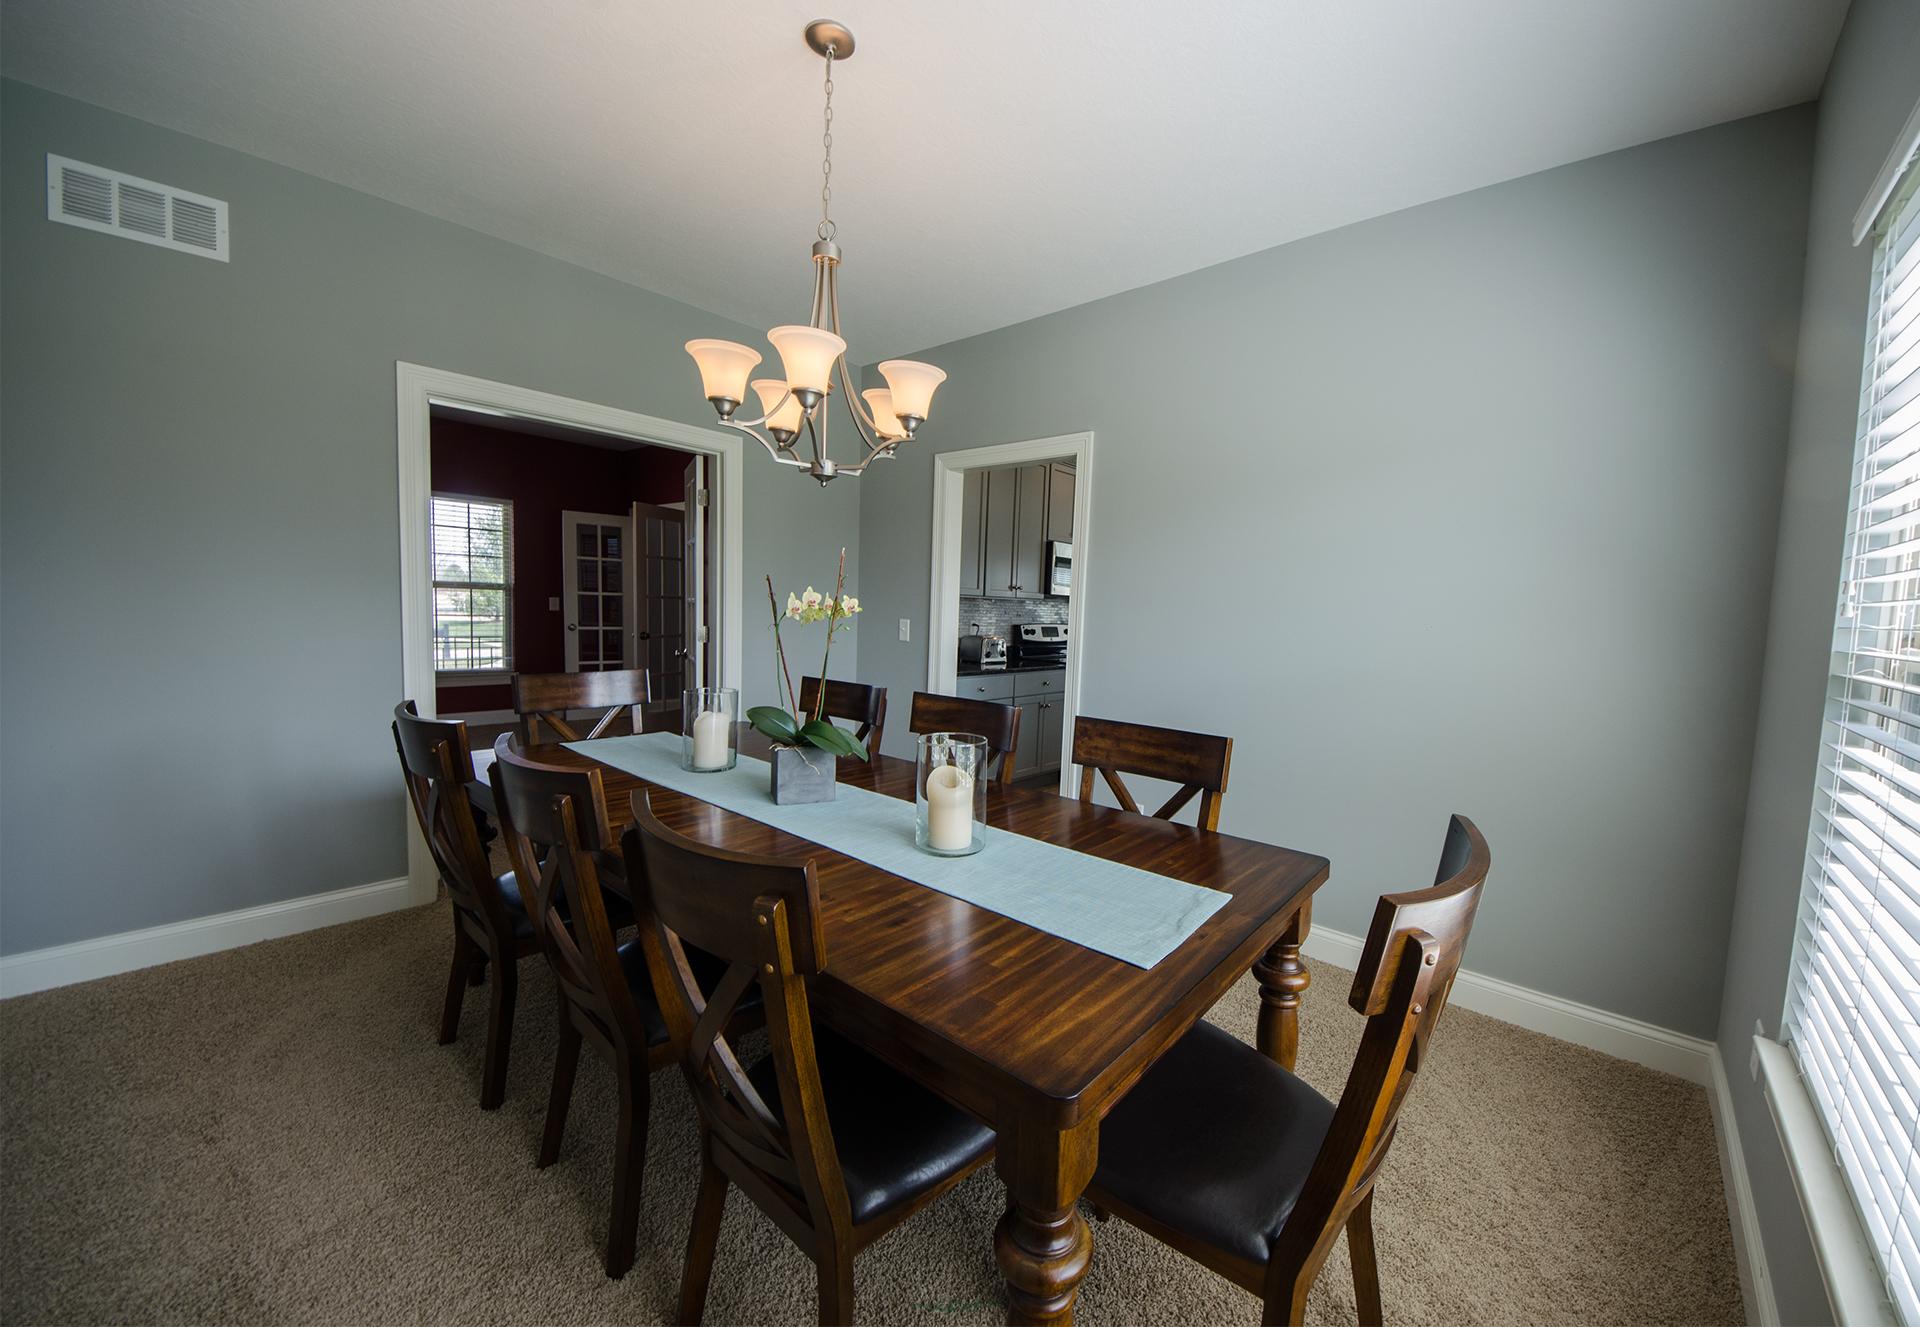 1234 English Bridle Ct. | Dayton, OH - Design Homes